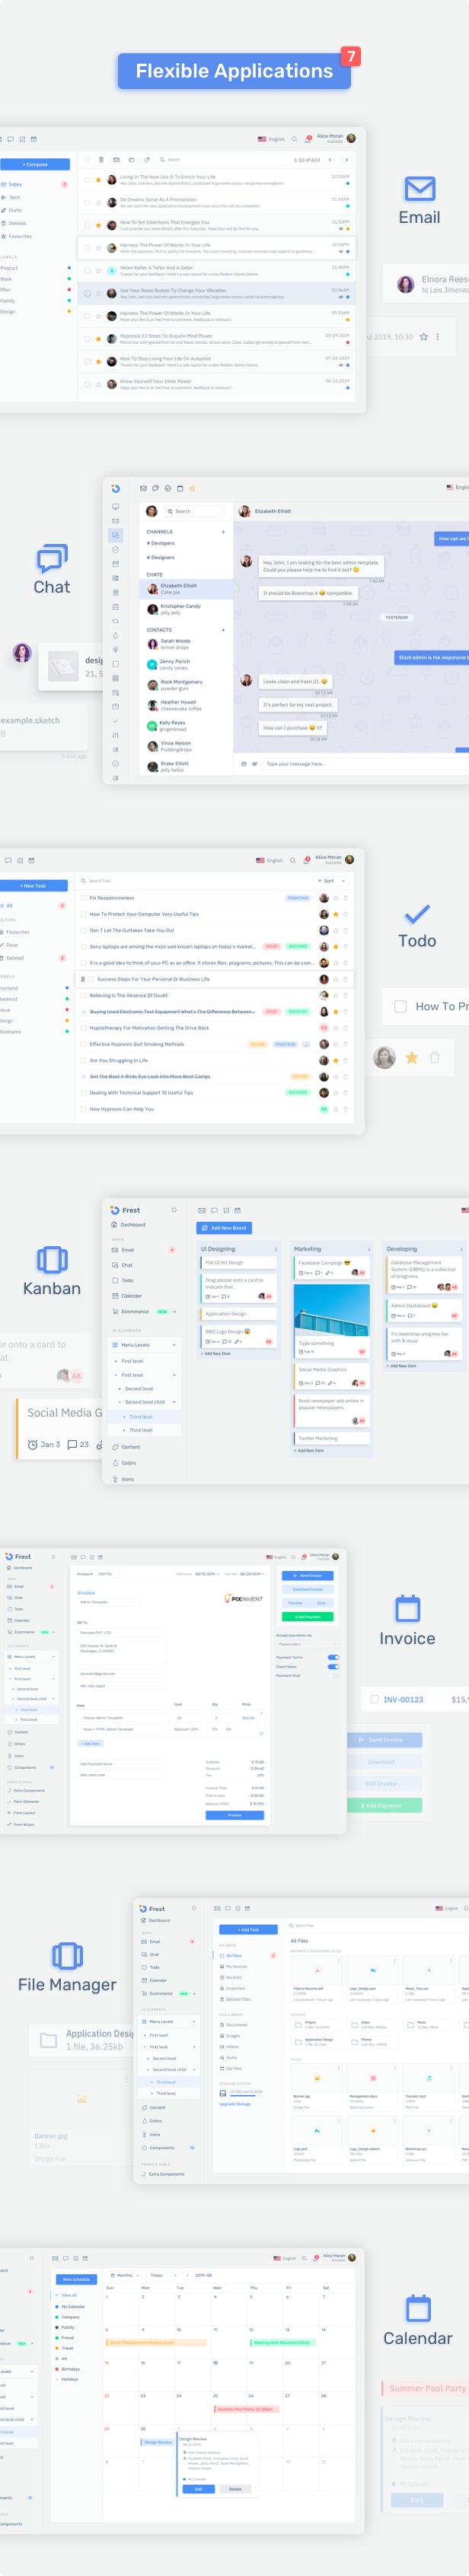 frjQmUK - Frest – Admin Dashboard UI Kit Sketch Template